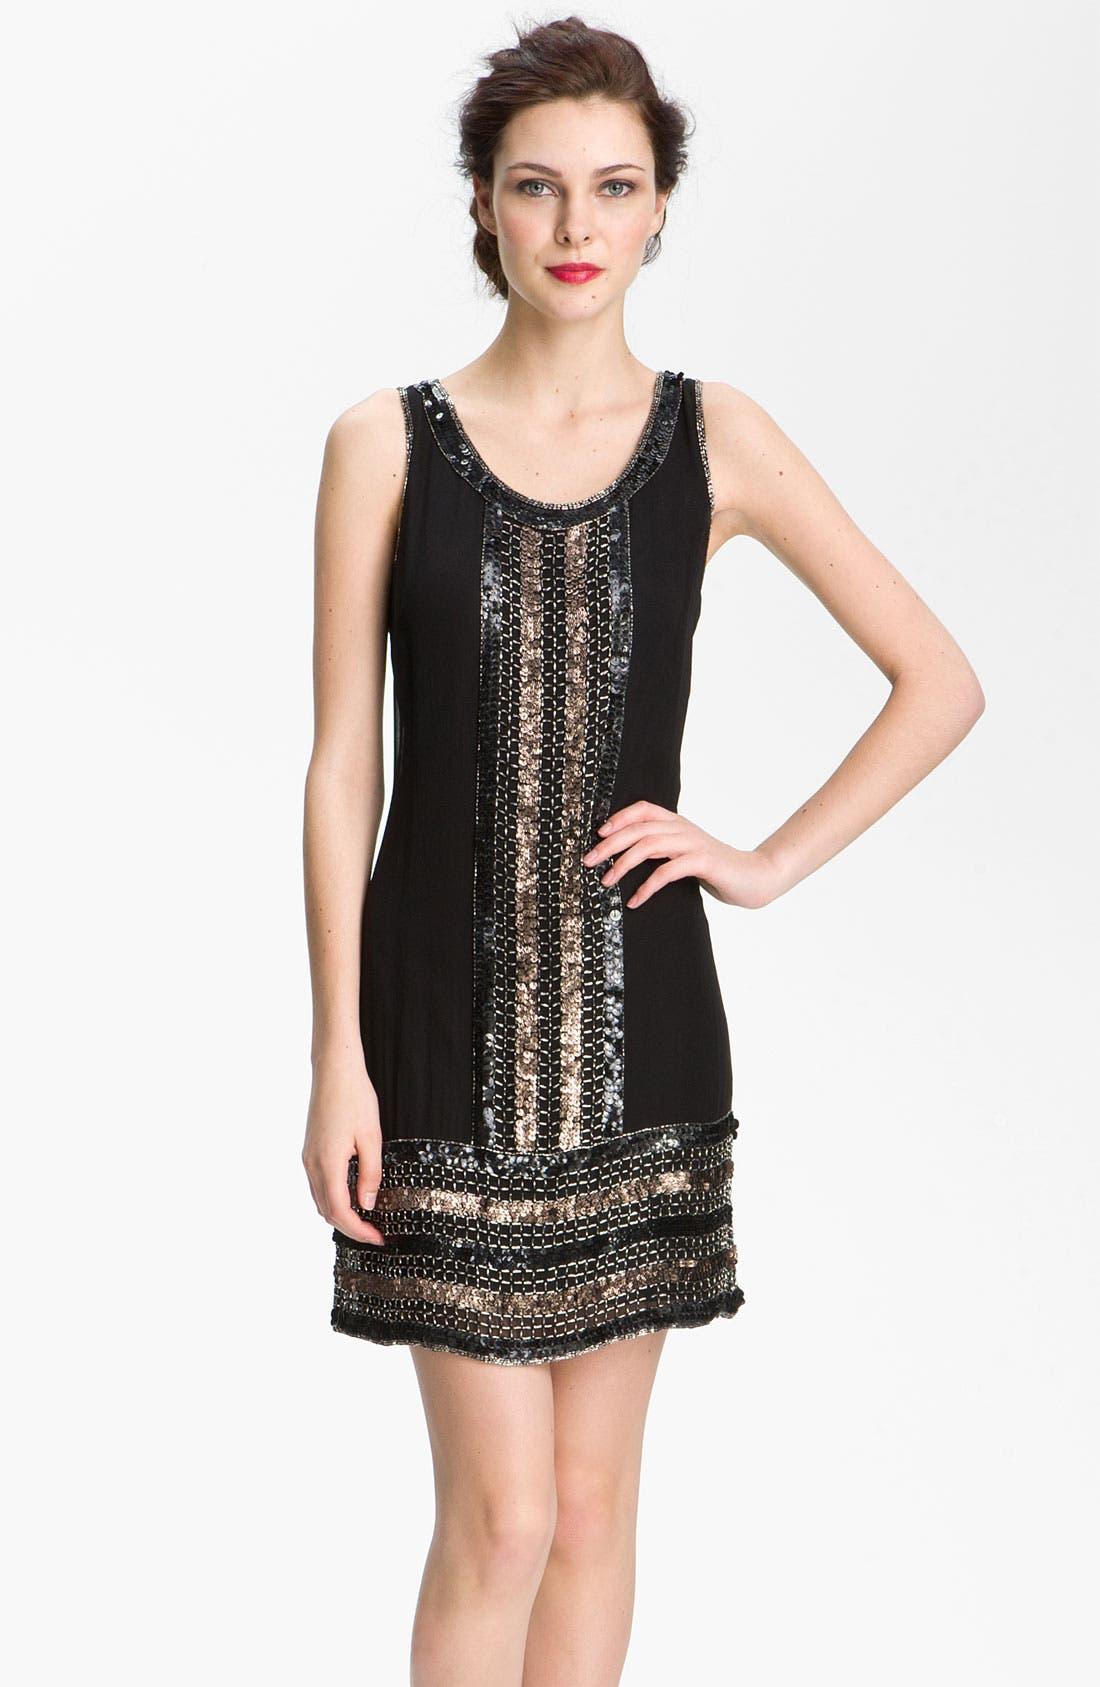 Alternate Image 1 Selected - Adrianna Papell Embellished Silk Chiffon Shift Dress (Petite)